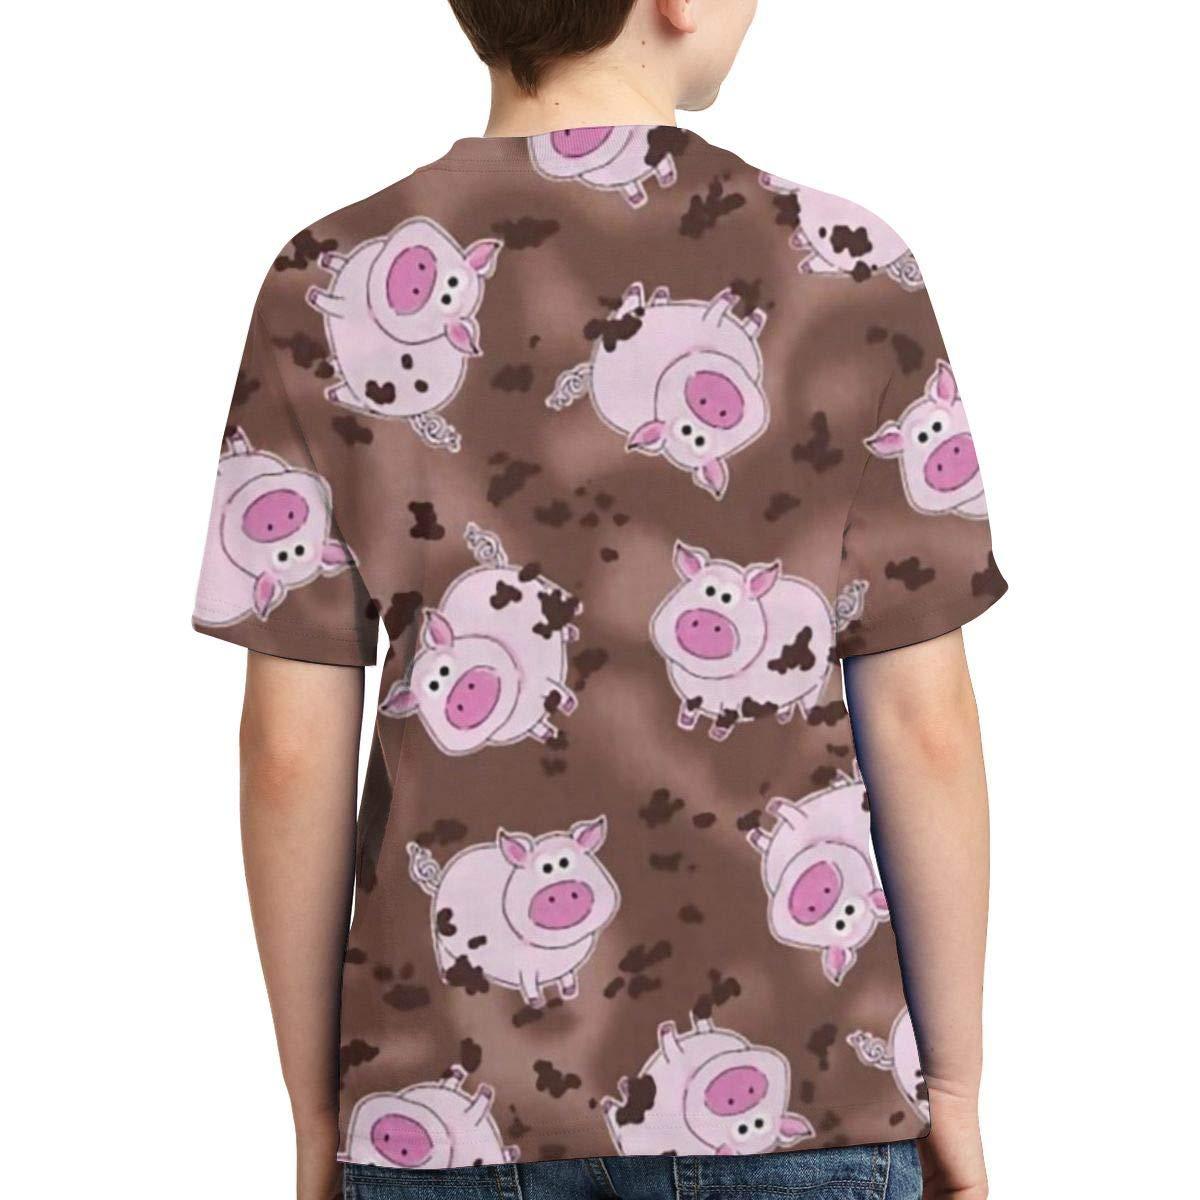 XS-XL Short-Sleeve Pink Pigs Shirts for Kids Cute Tunic Shirt Dress